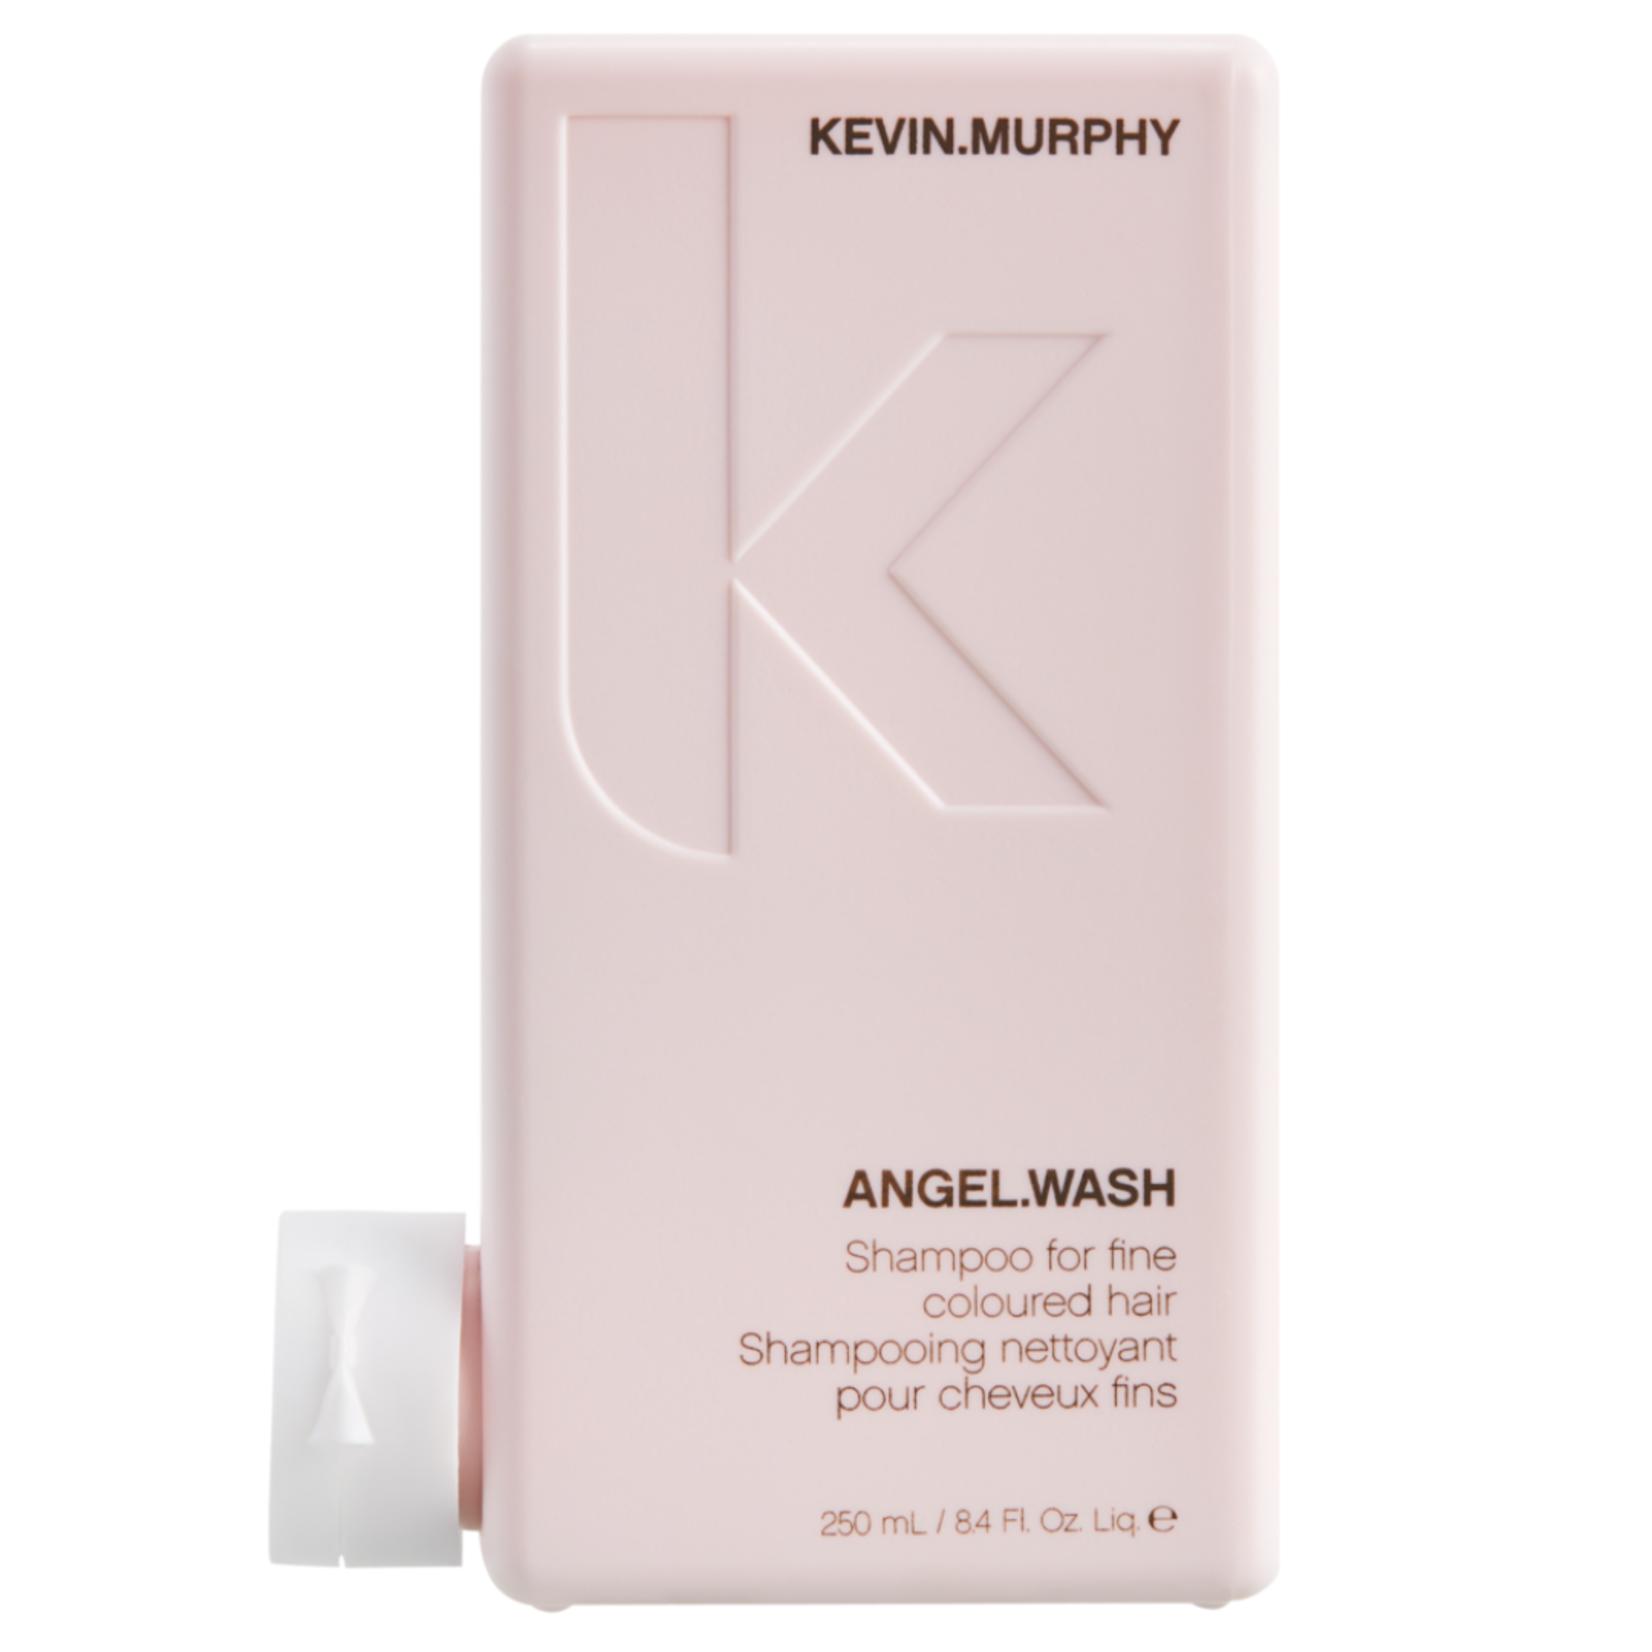 KEVIN.MURPHY KEVIN.MURPHY - ANGEL.WASH 8.4 oz